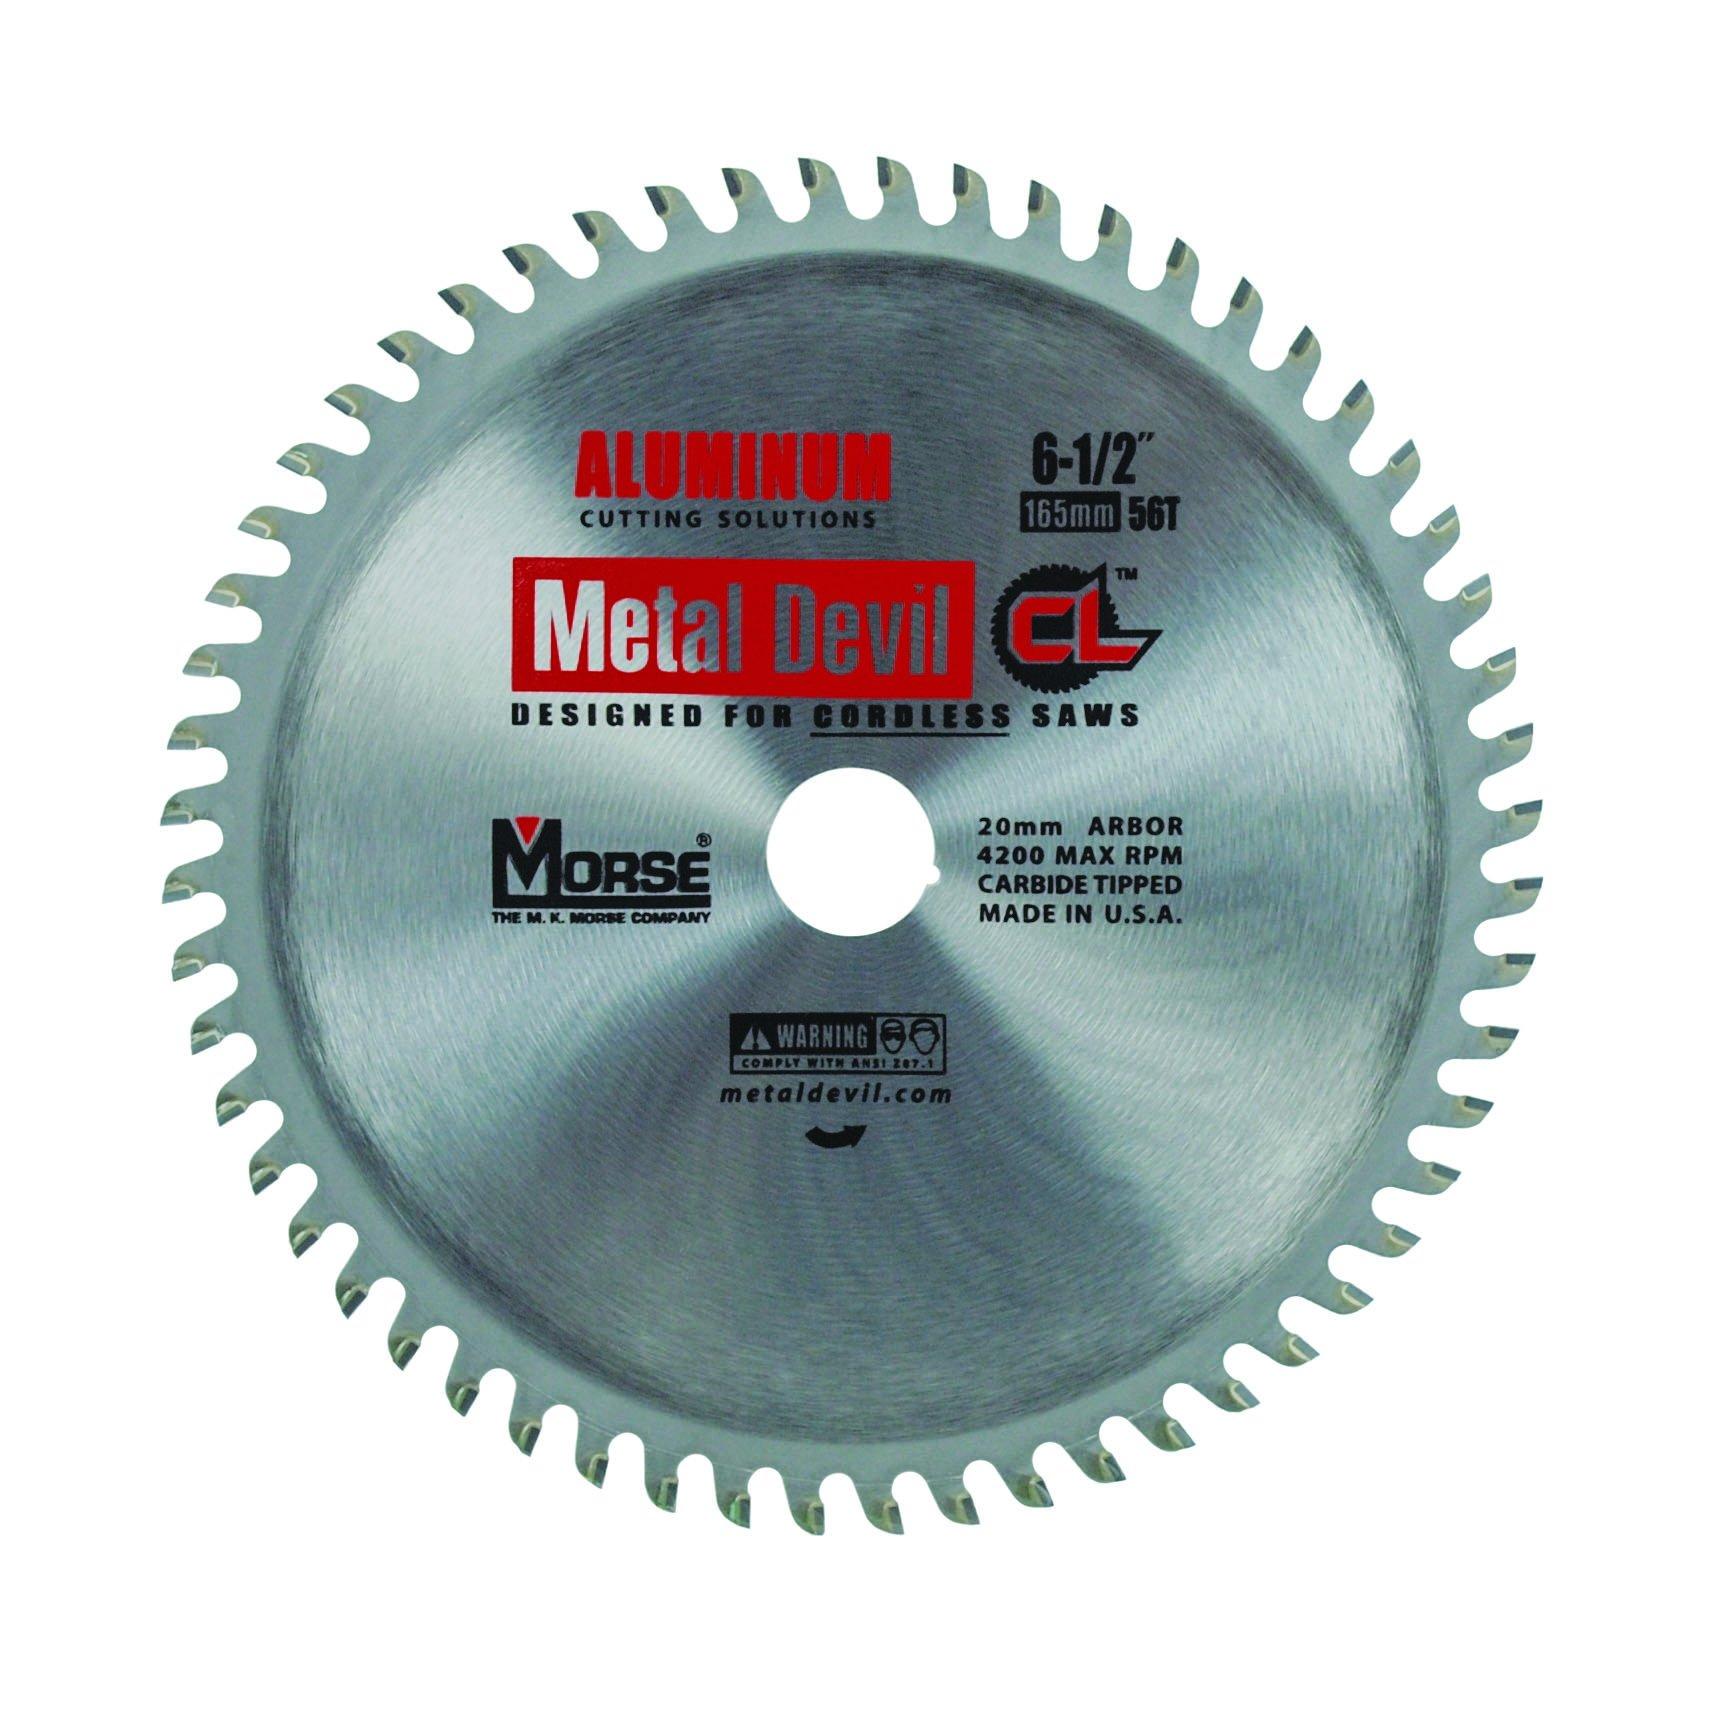 MK Morse CSM6505620CLAC Metal Devil Circular Saw Blade, Aluminum Application, 6-1/2-Inch Diameter, 56 TPI, 20mm Arbor